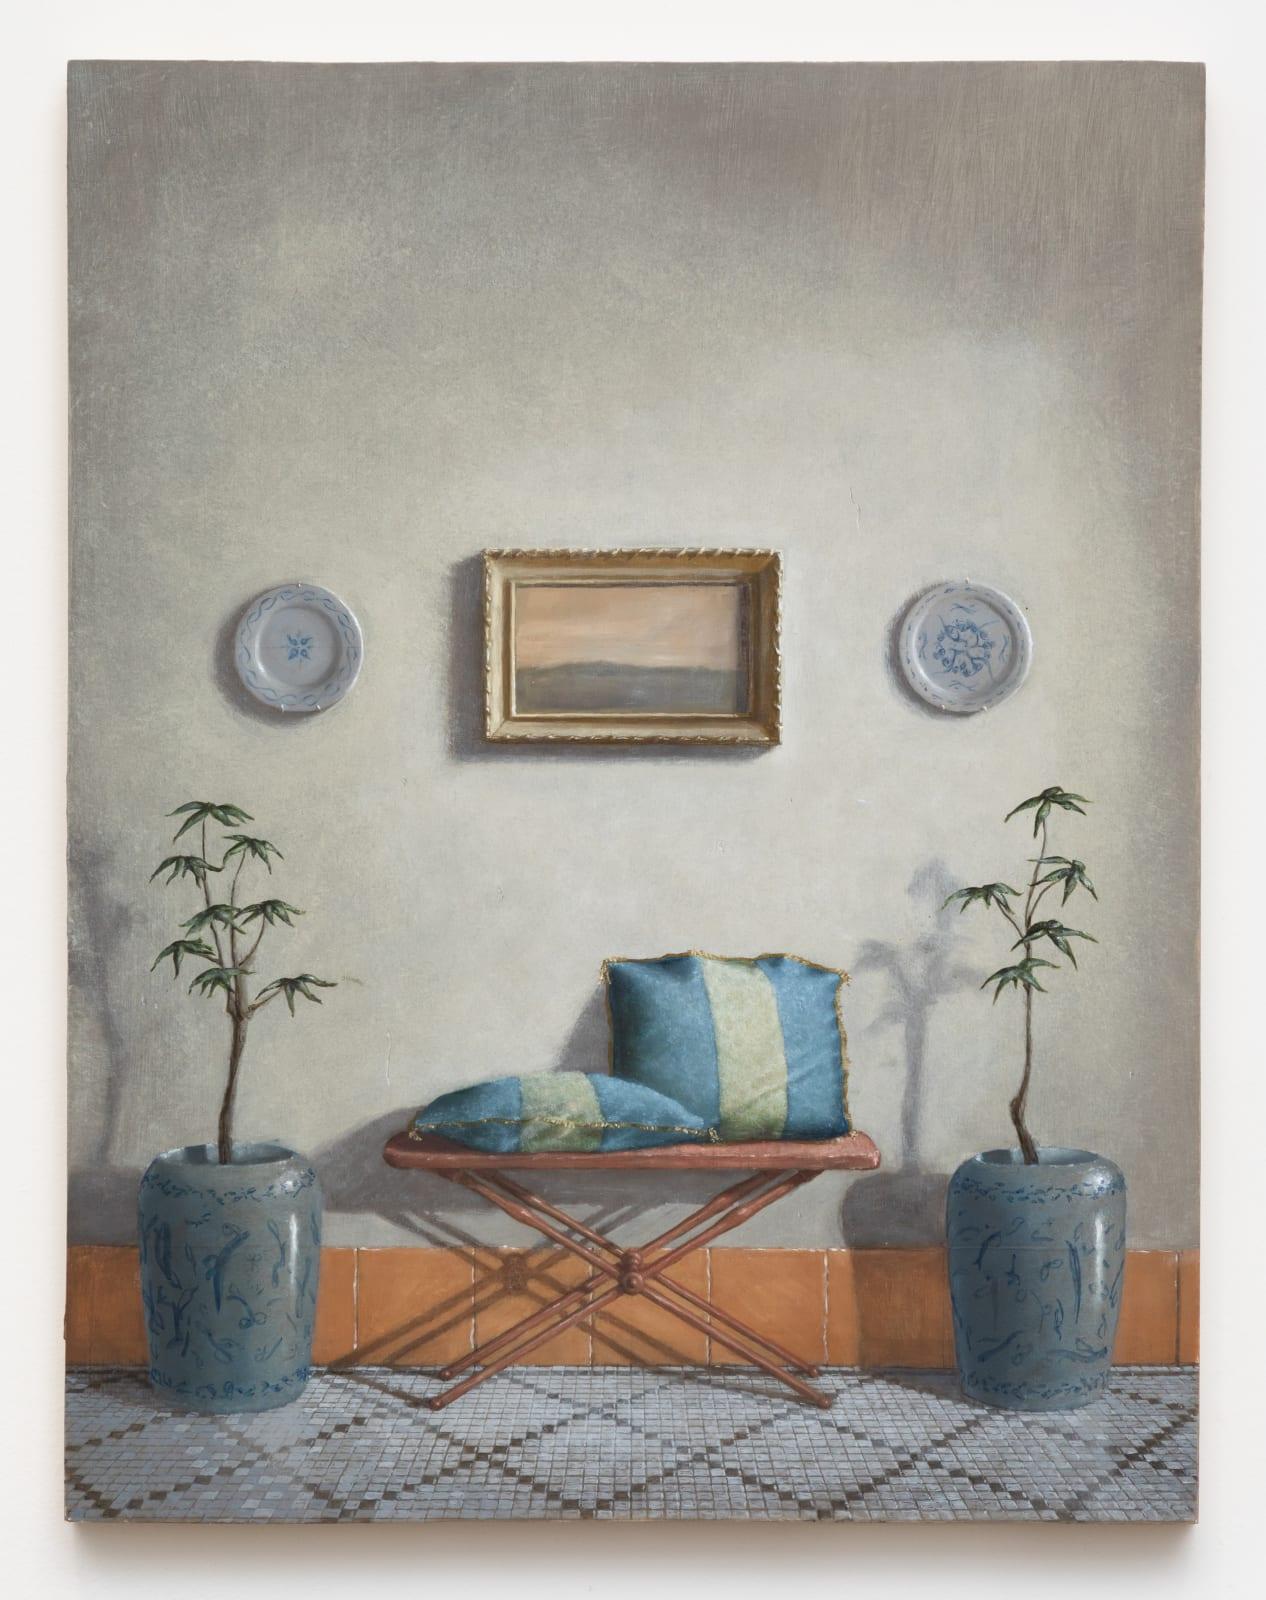 Quentin James McCaffrey, Landscape with Pillows, 2020